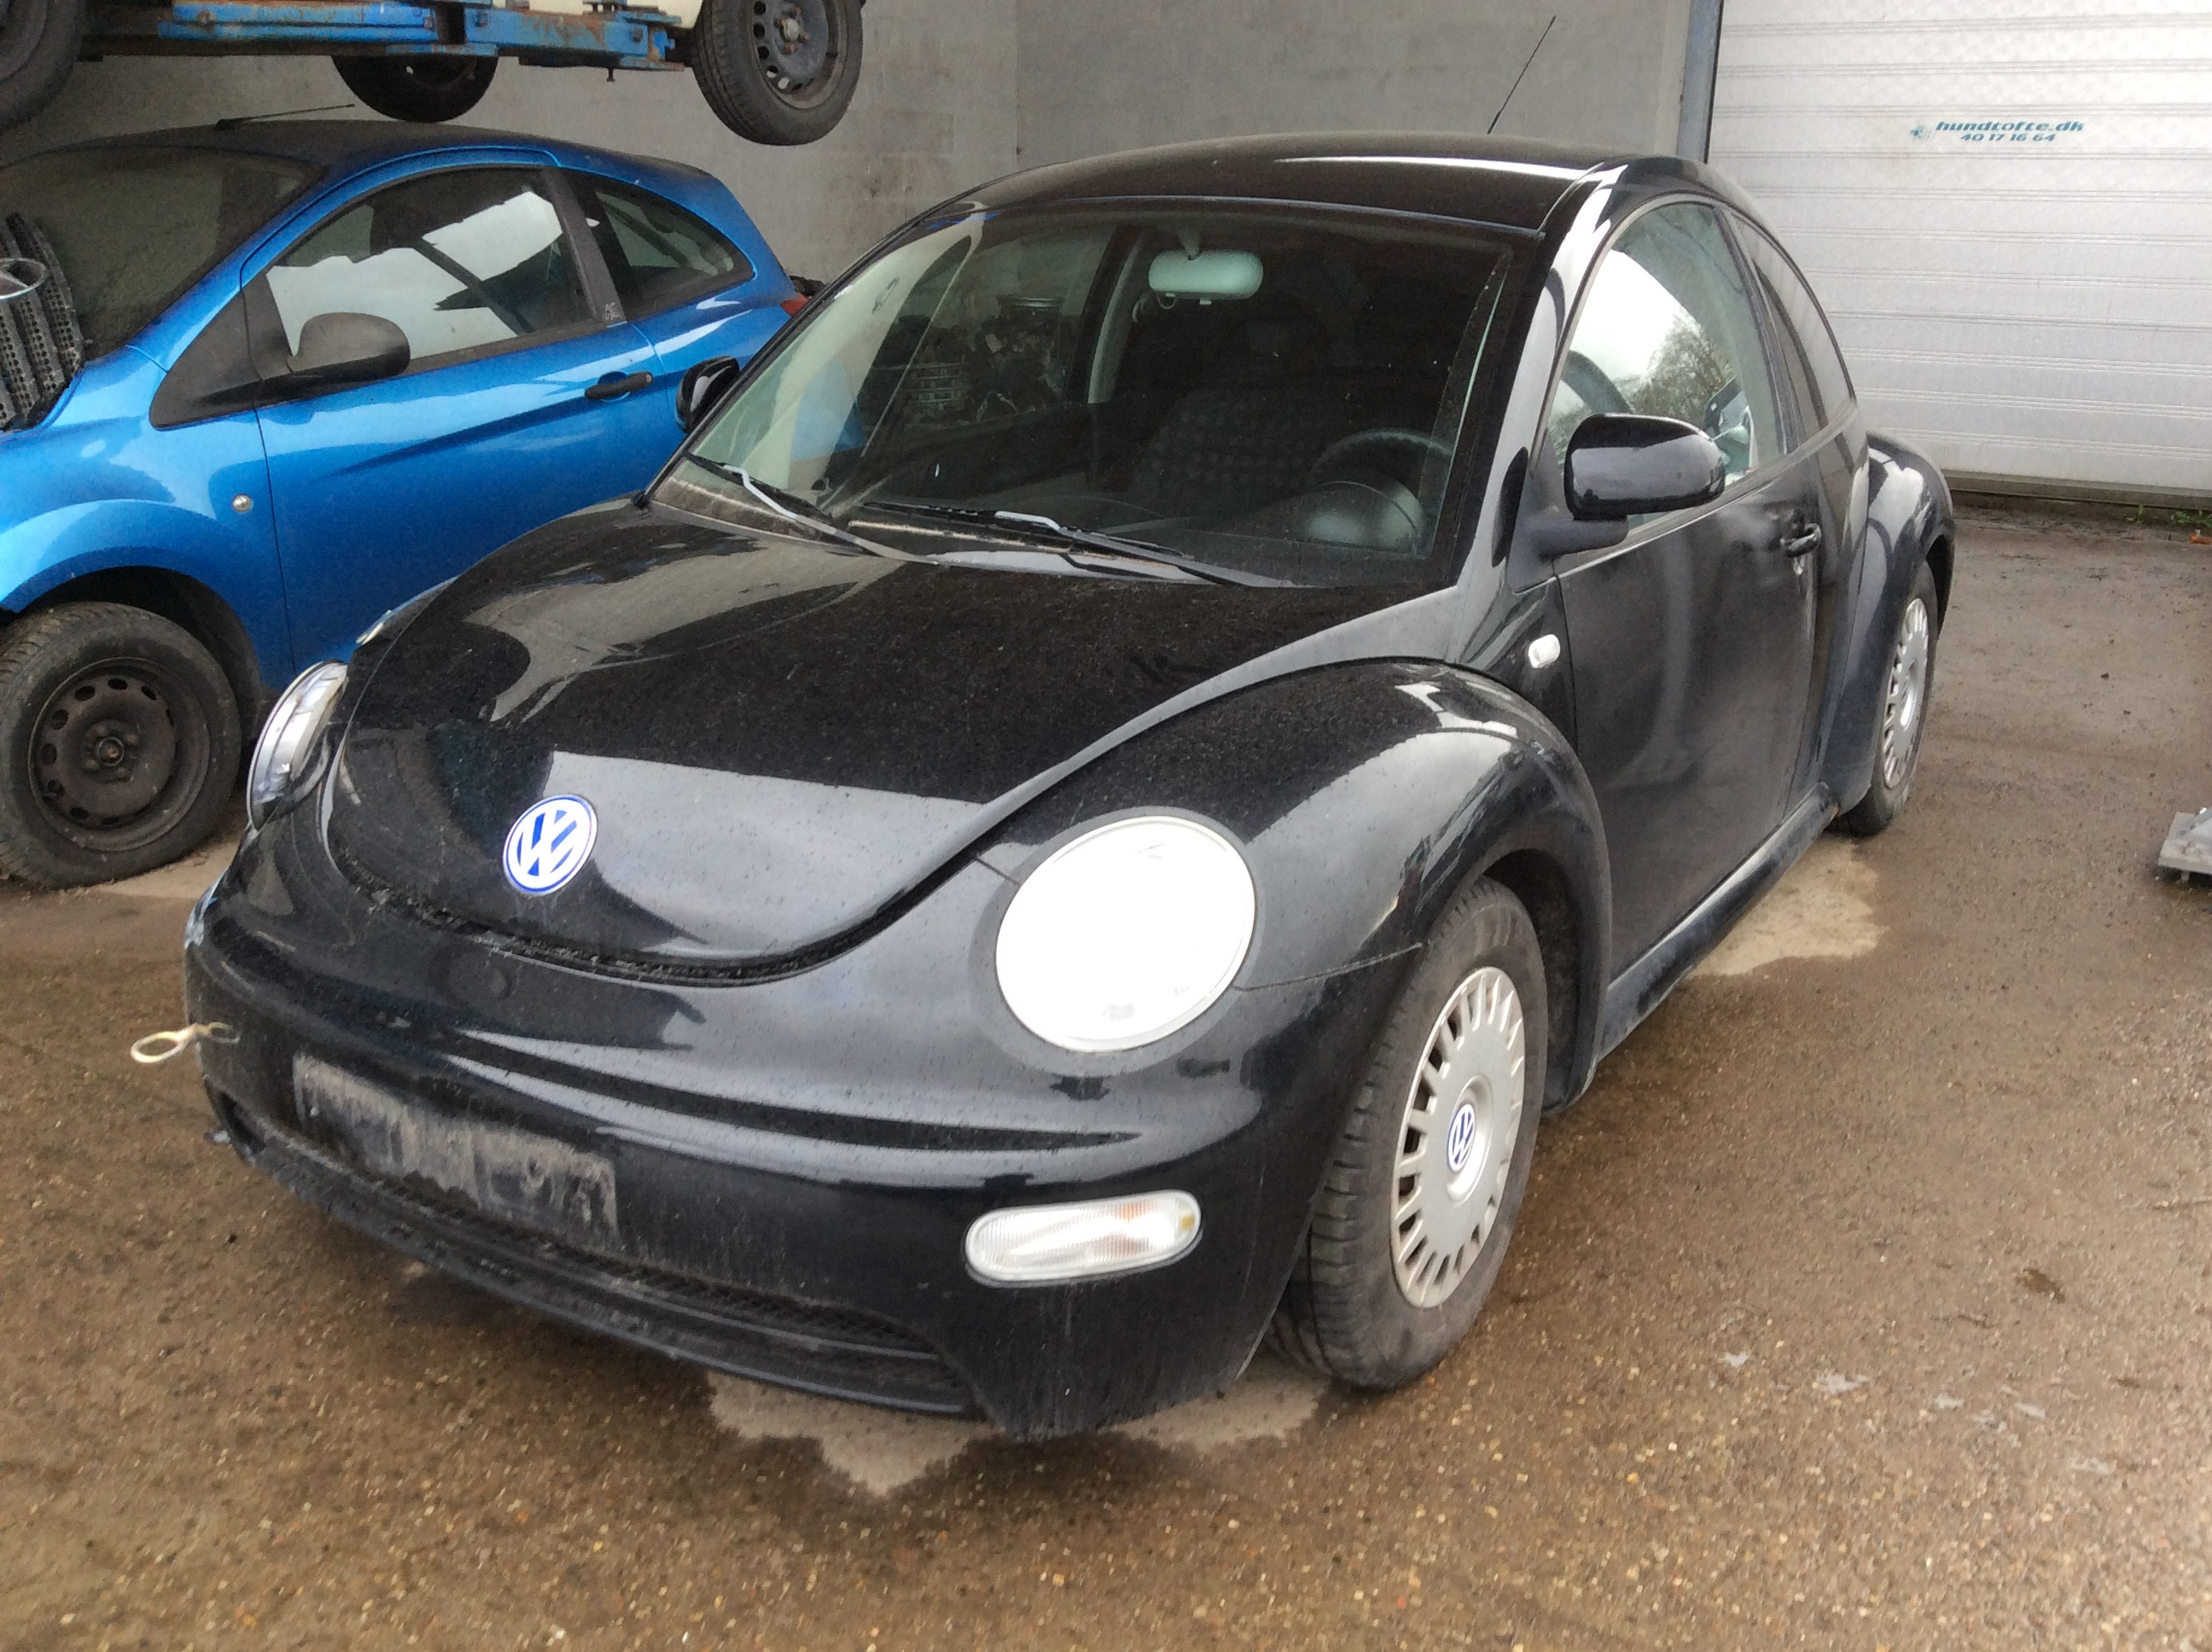 VW BEEDLE 2,0 år 2000,60-0417